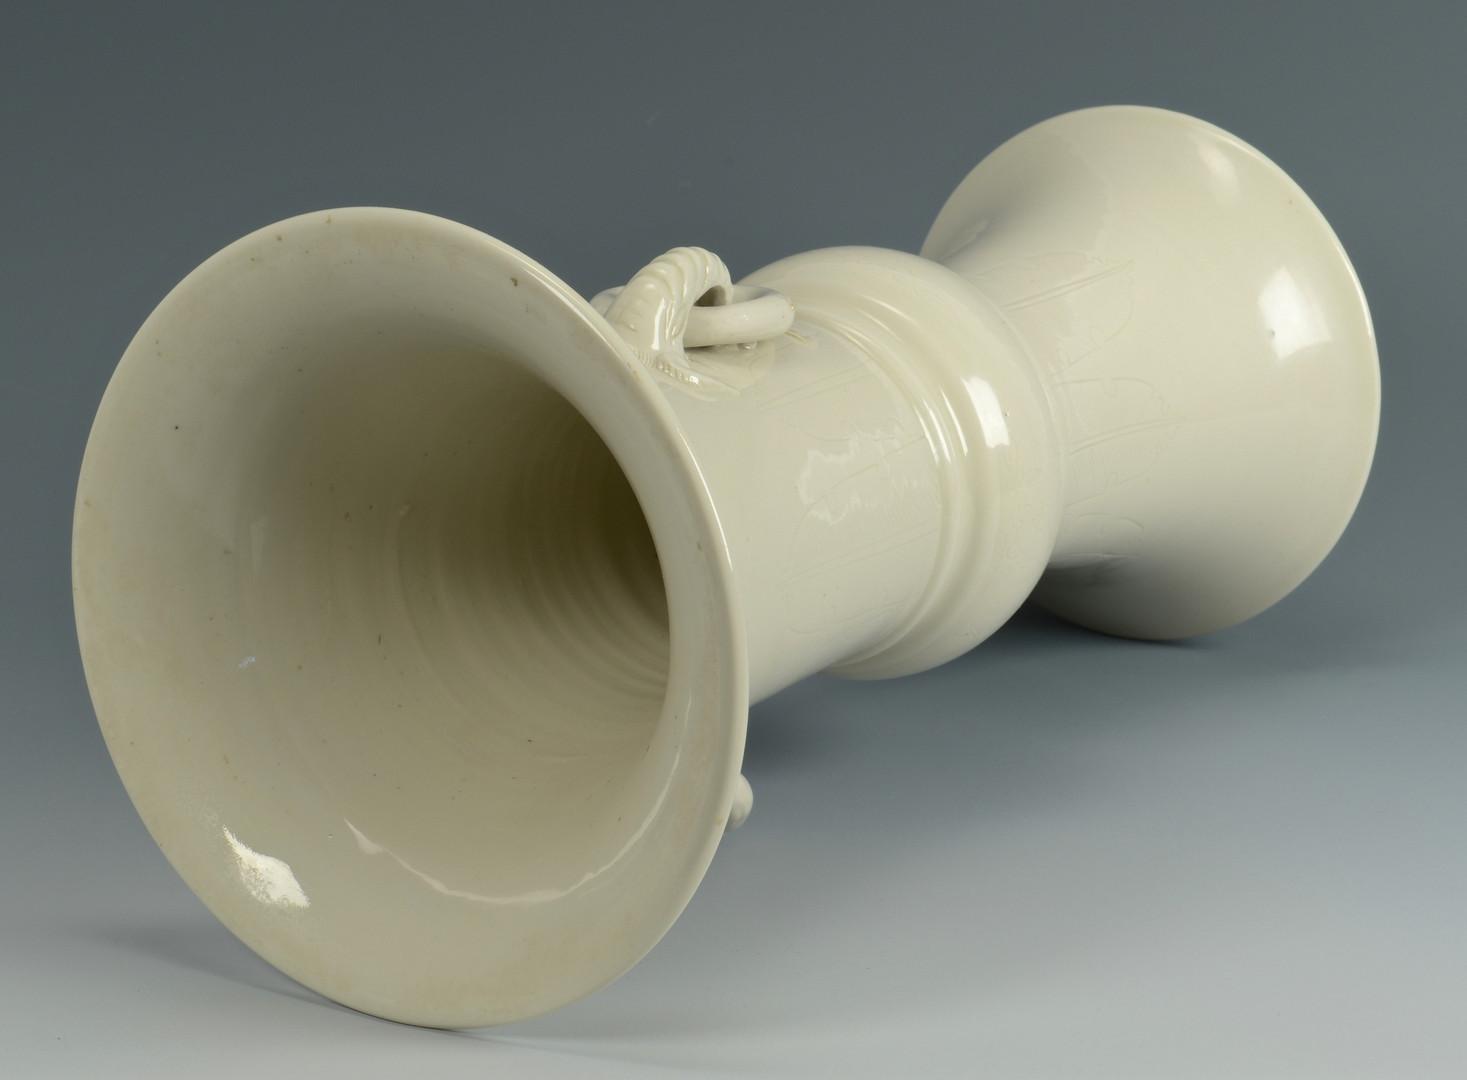 Lot 230: Chinese Blanc de Chine Vase w/ Elephant Handles